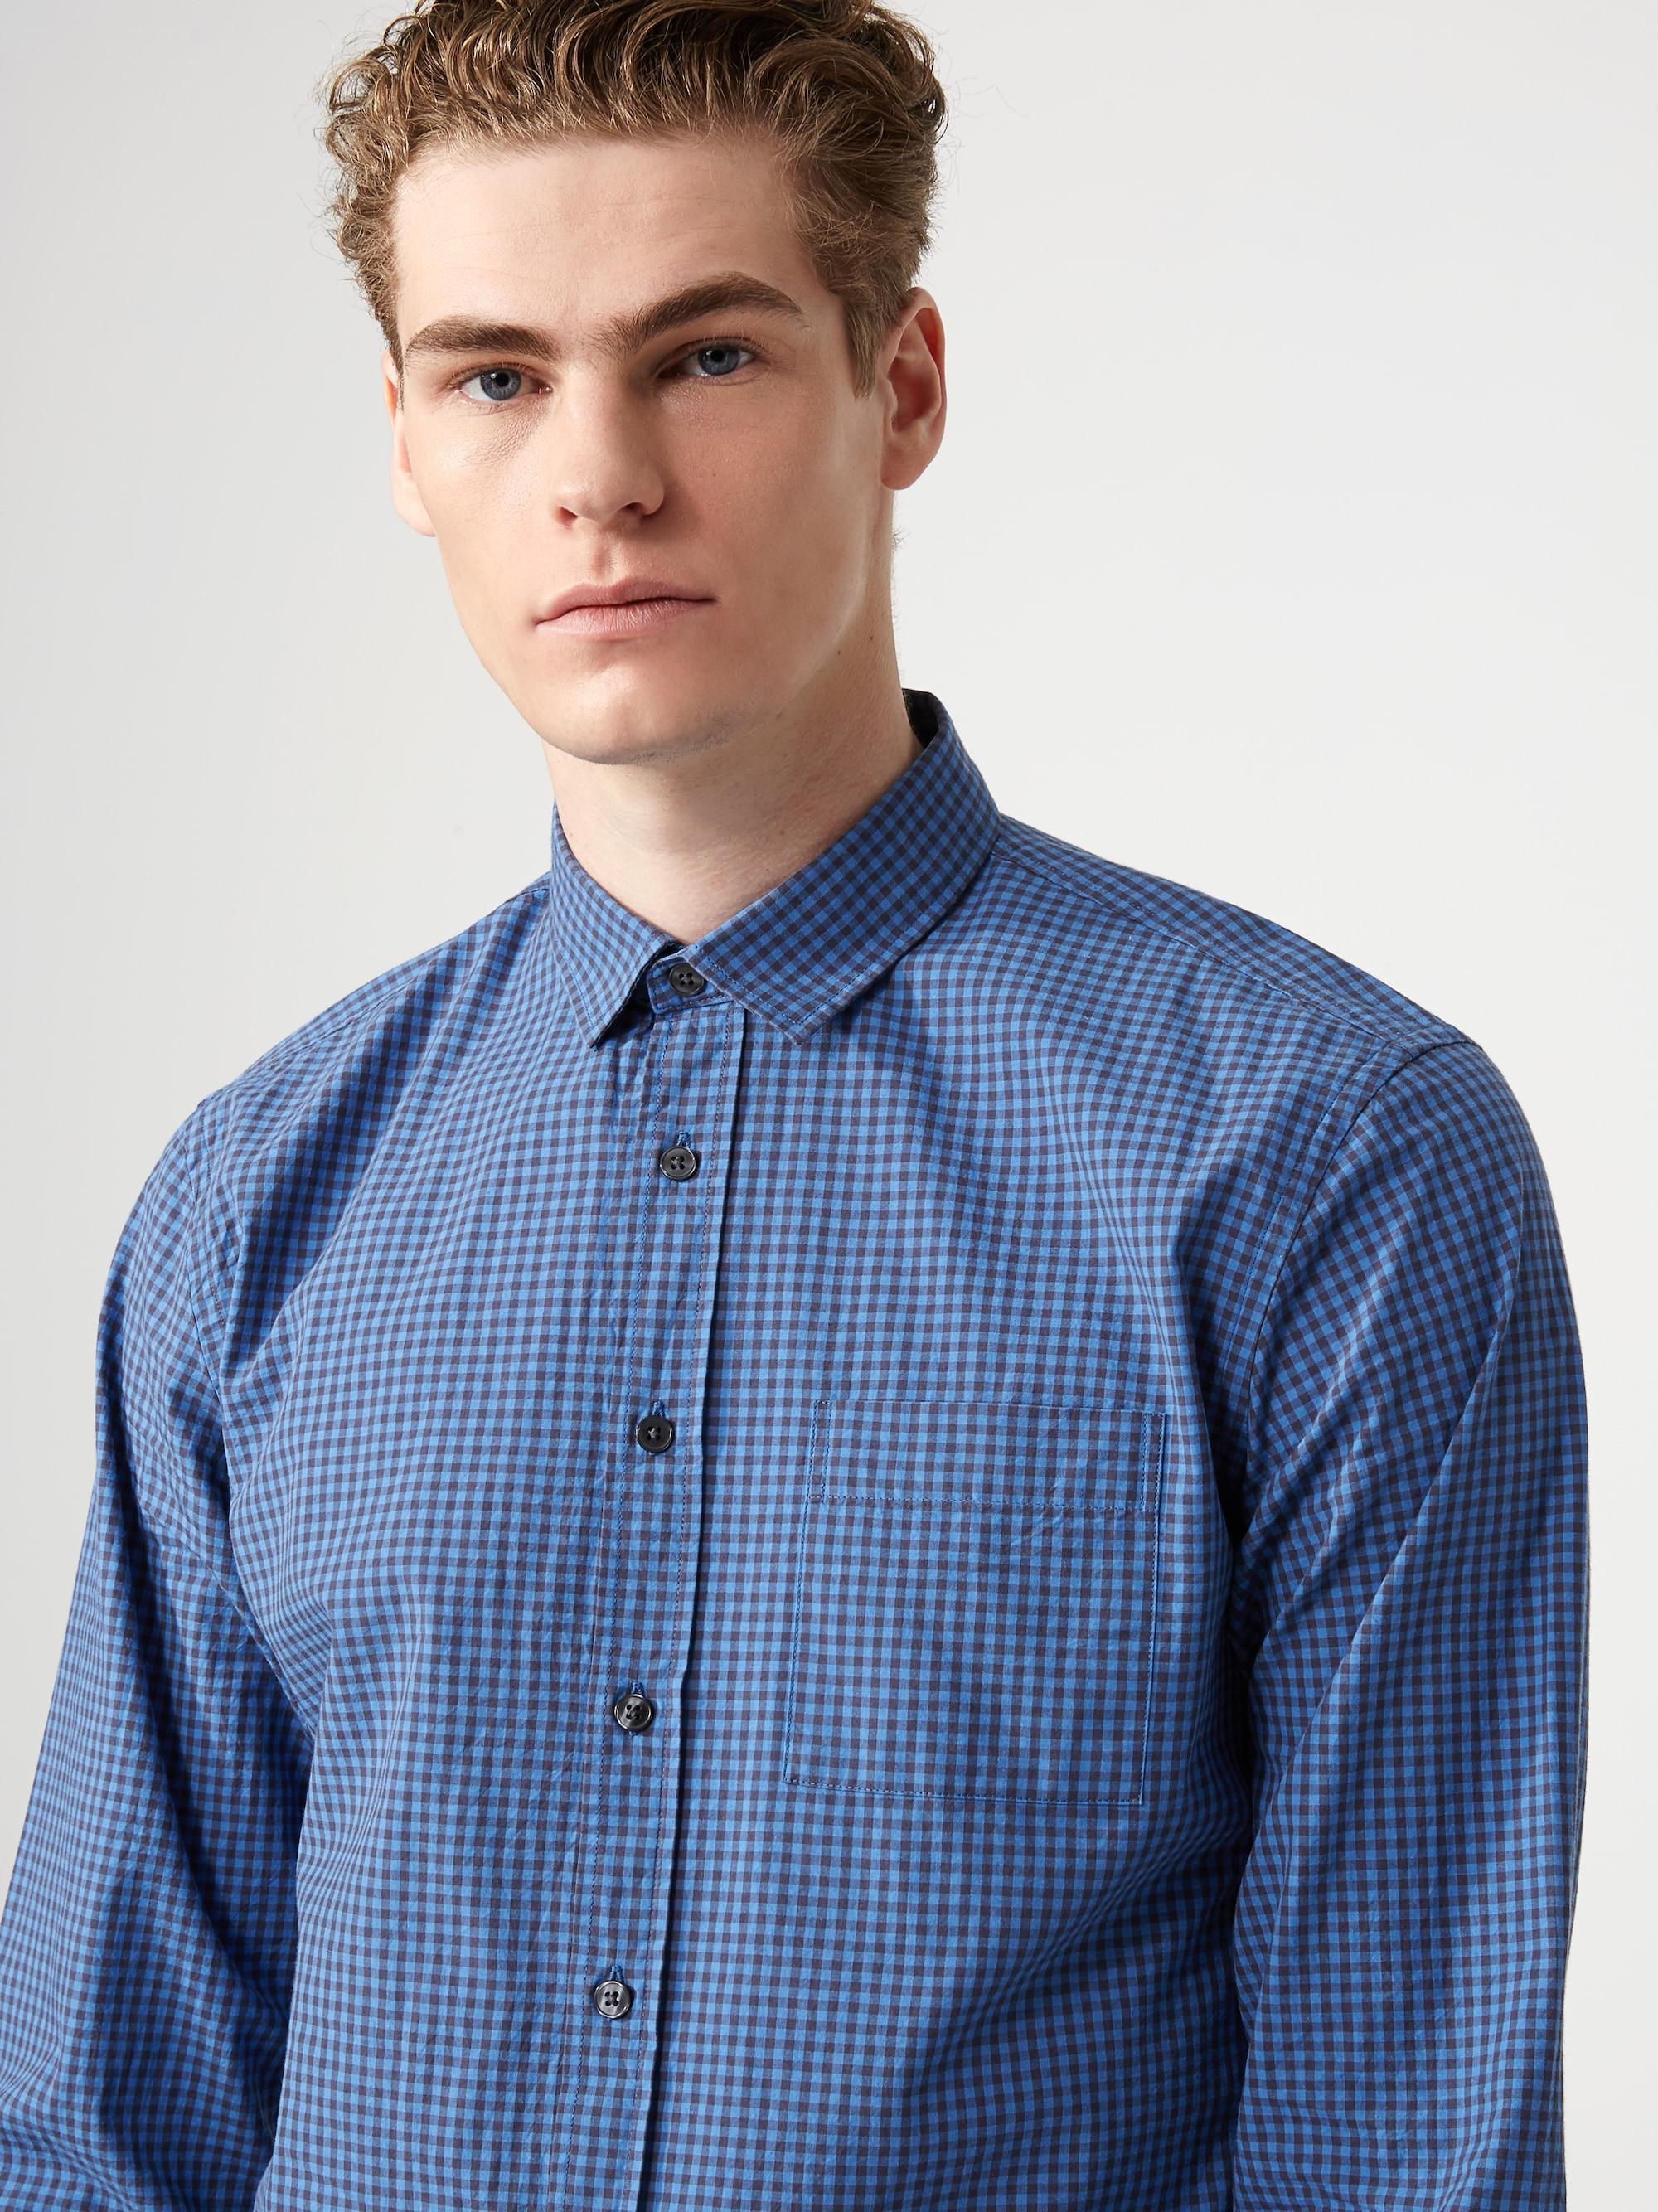 Frank oak mini gingham check poplin shirt in riviera in for Frank and oak shirt